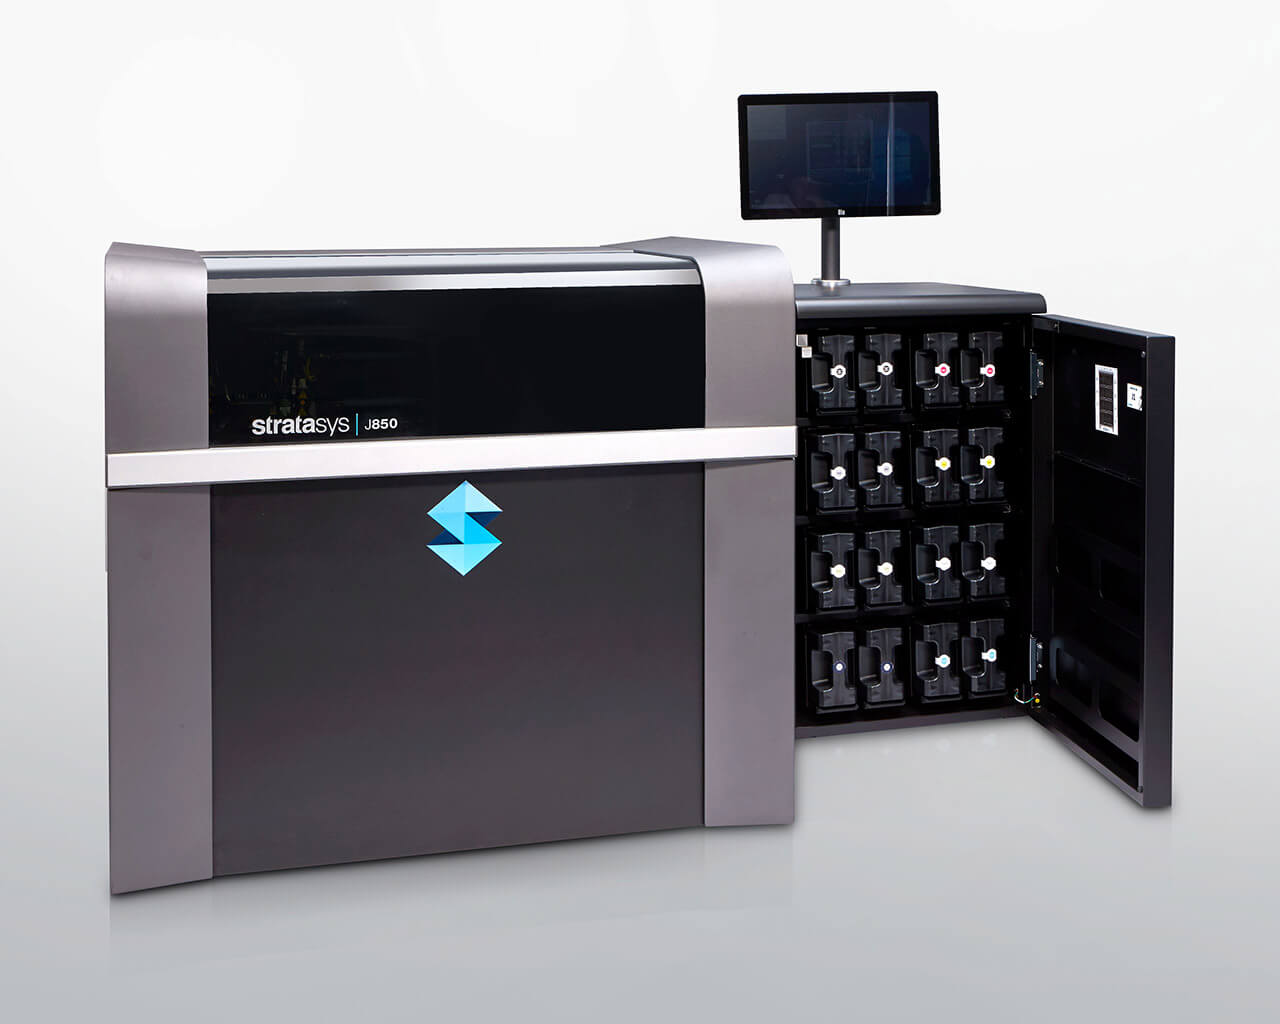 J835 Stratasys - Imprimantes 3D